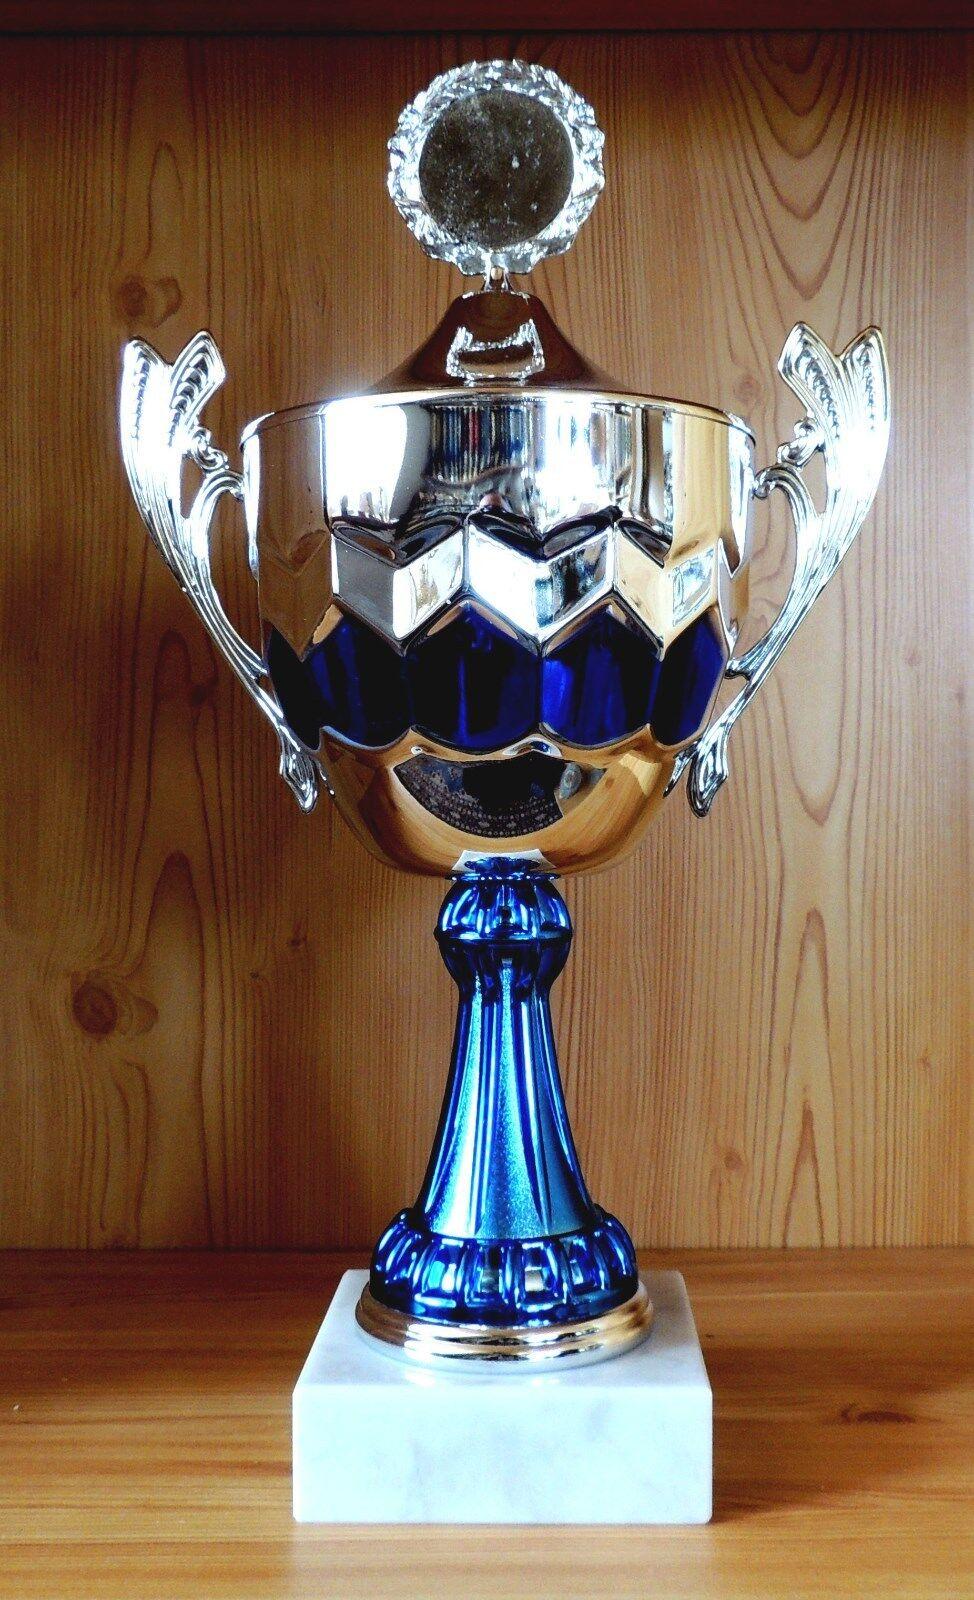 1 Henkelpokal Wanderpokal silber mit Emblem 44cm  WP2(Pokal Pokale Gravur Sport)